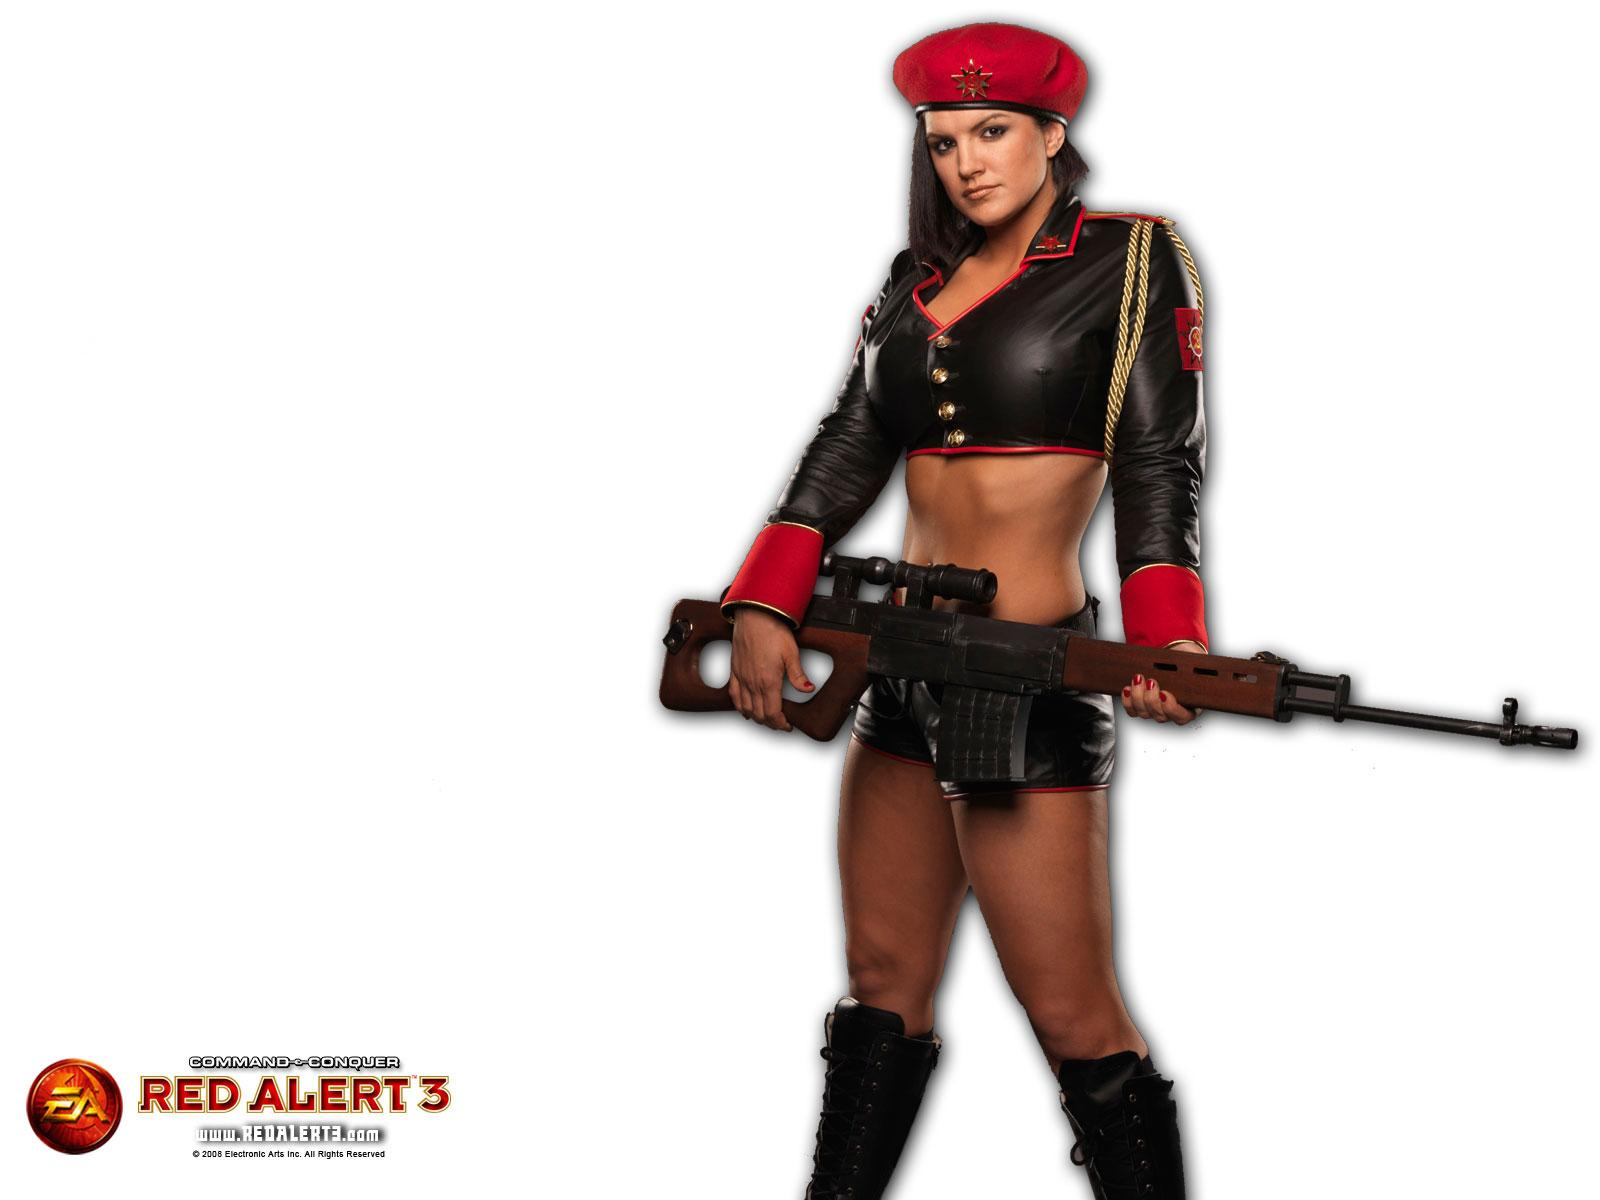 Red alert 3 xxx fakes xxx muscle whores